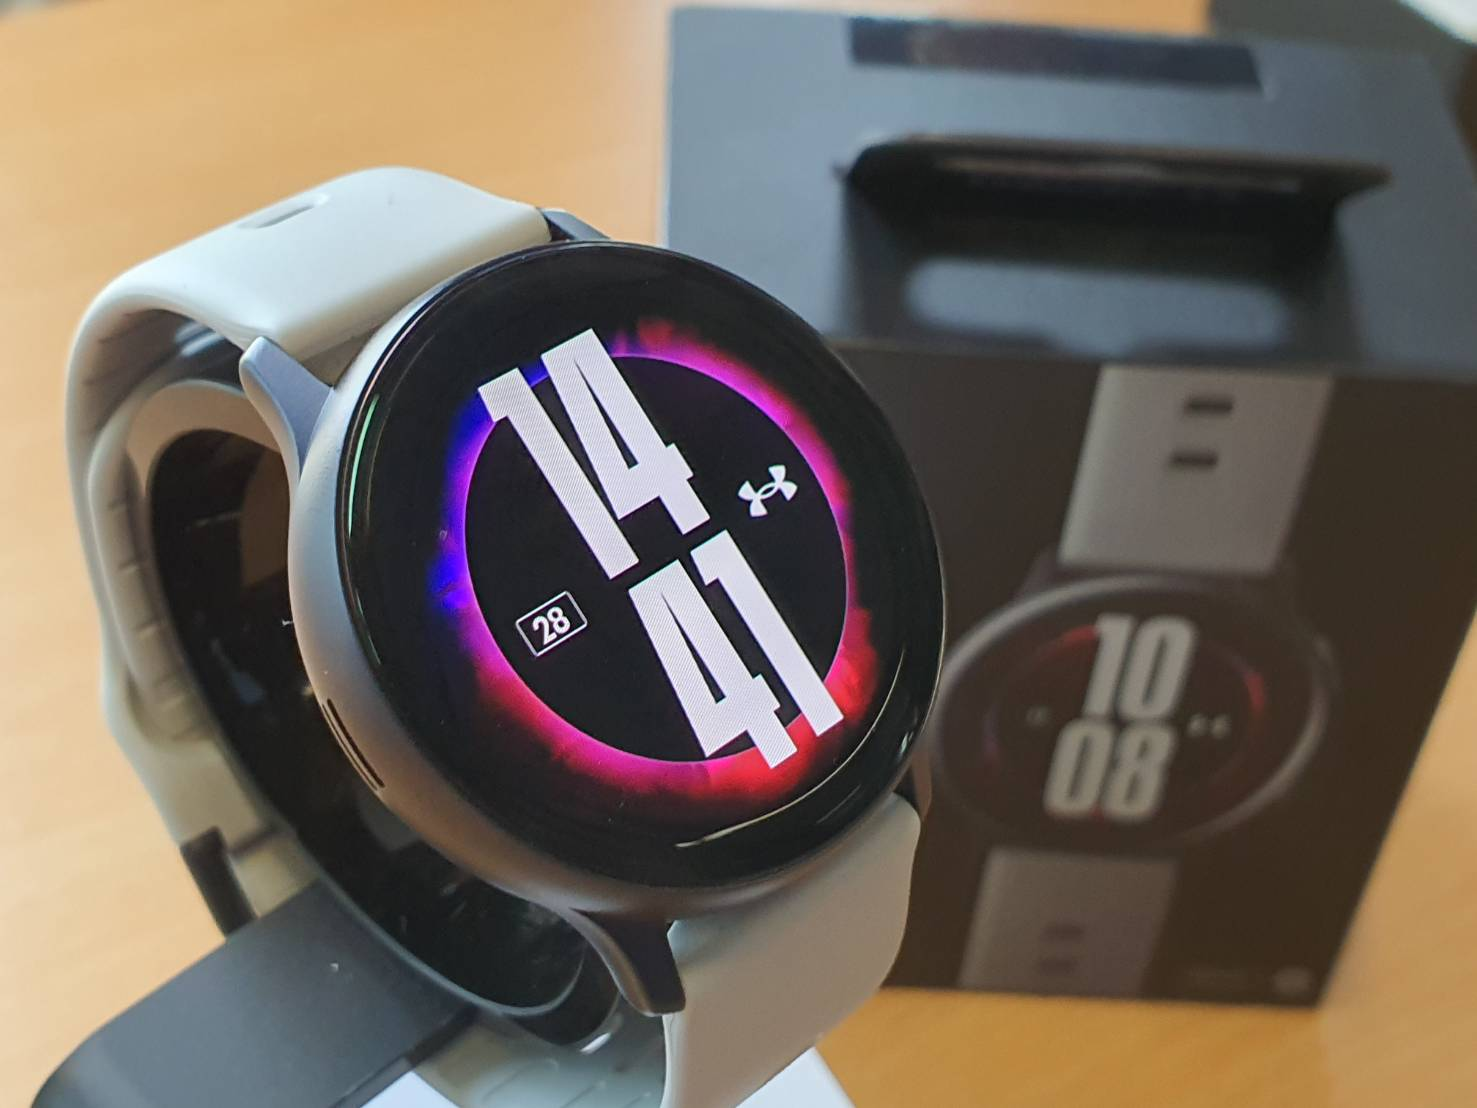 Samsung Galaxy Watch Active 2 เปิดตัวแล้ว ราคาเริ่มต้น 9,900 บาท